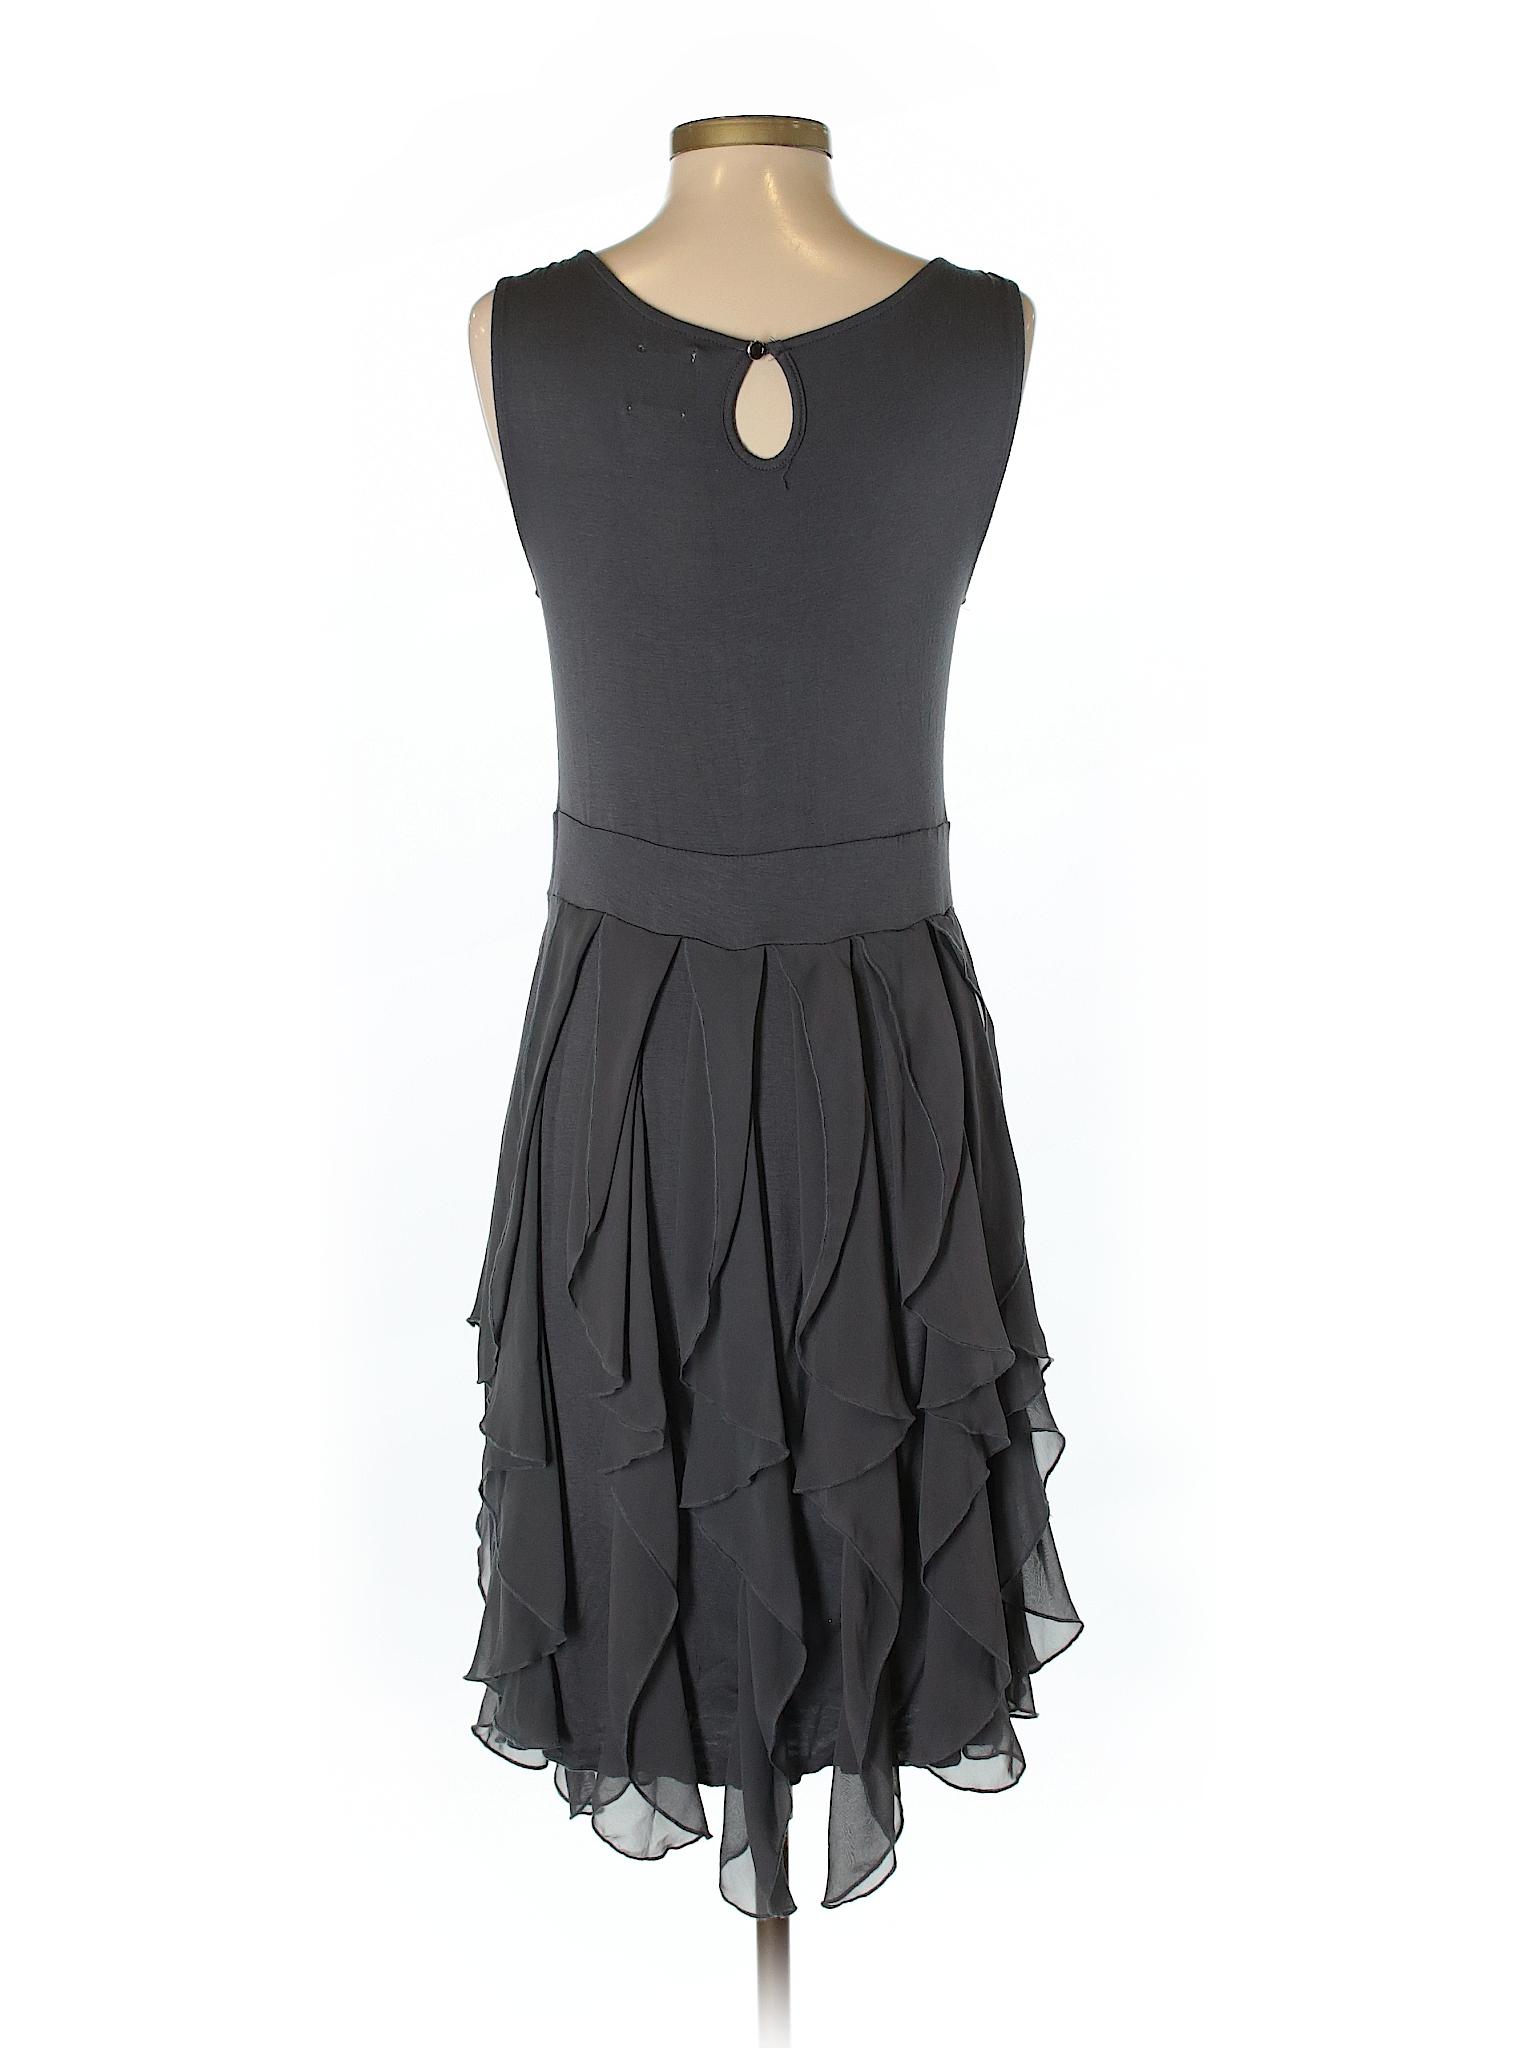 Rac Dress Dress Selling Selling Ric Casual Casual Ric Selling Rac BAqAwgWrtf